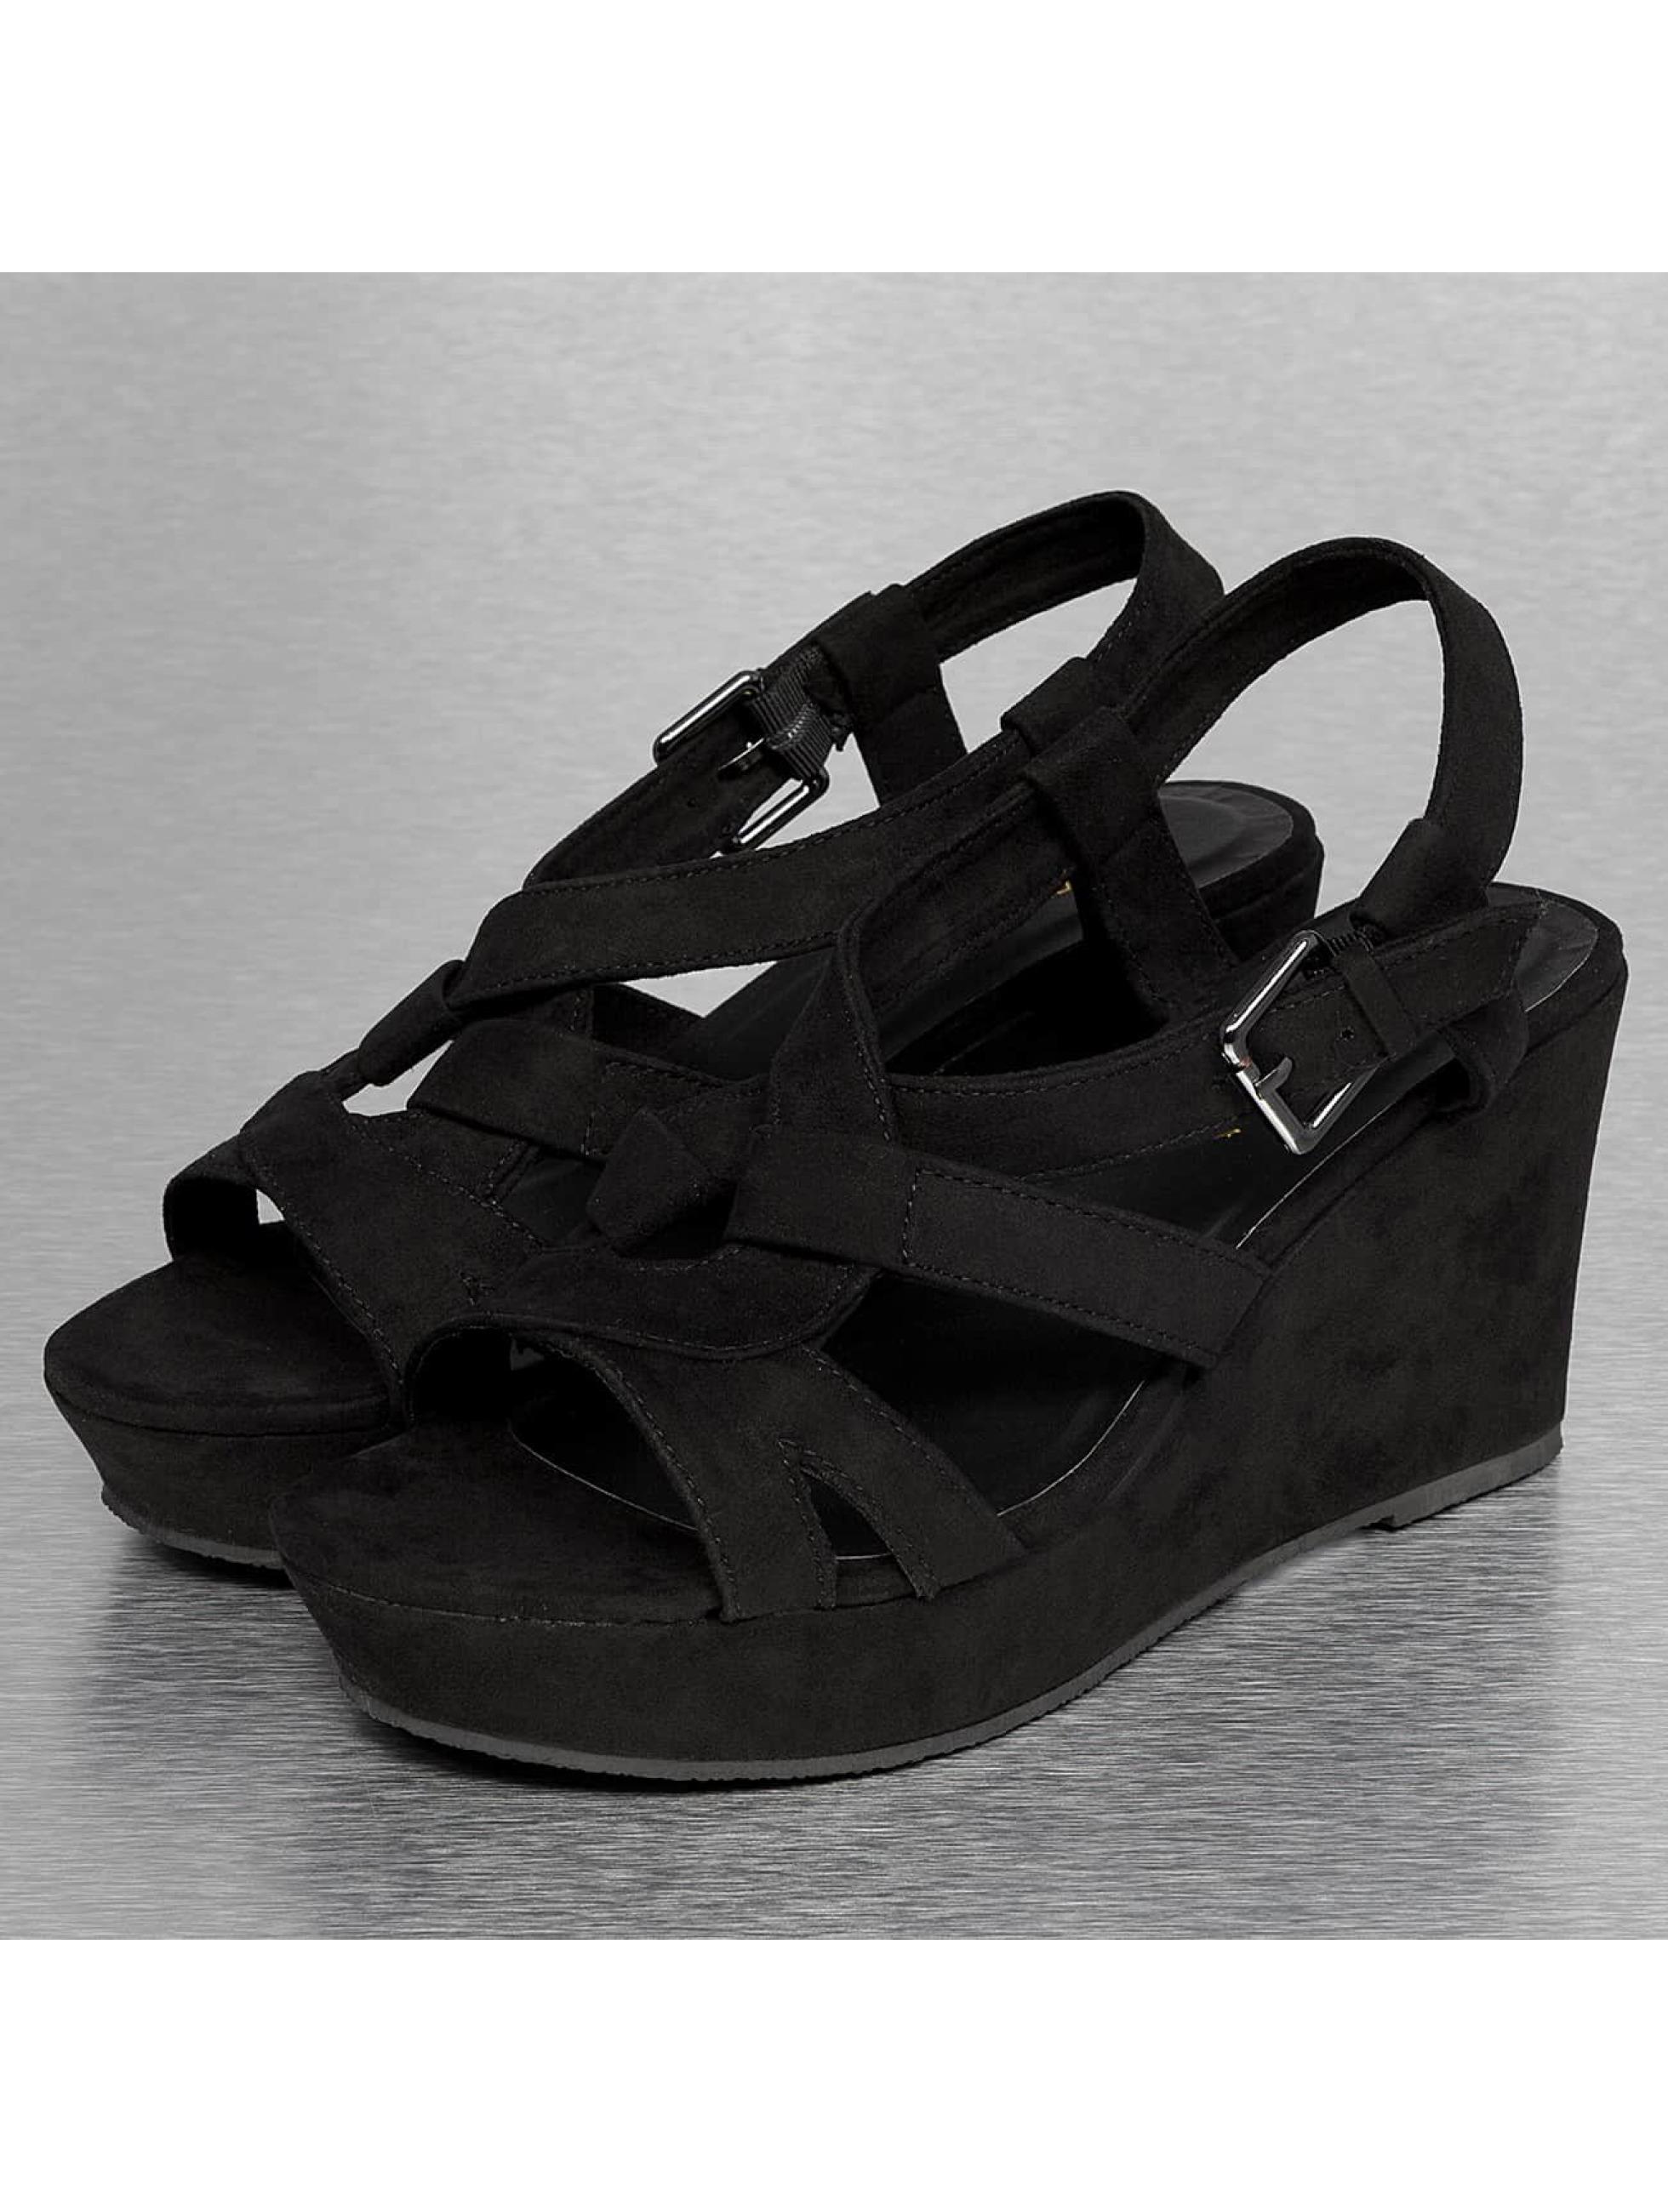 Sandalen Kate in schwarz